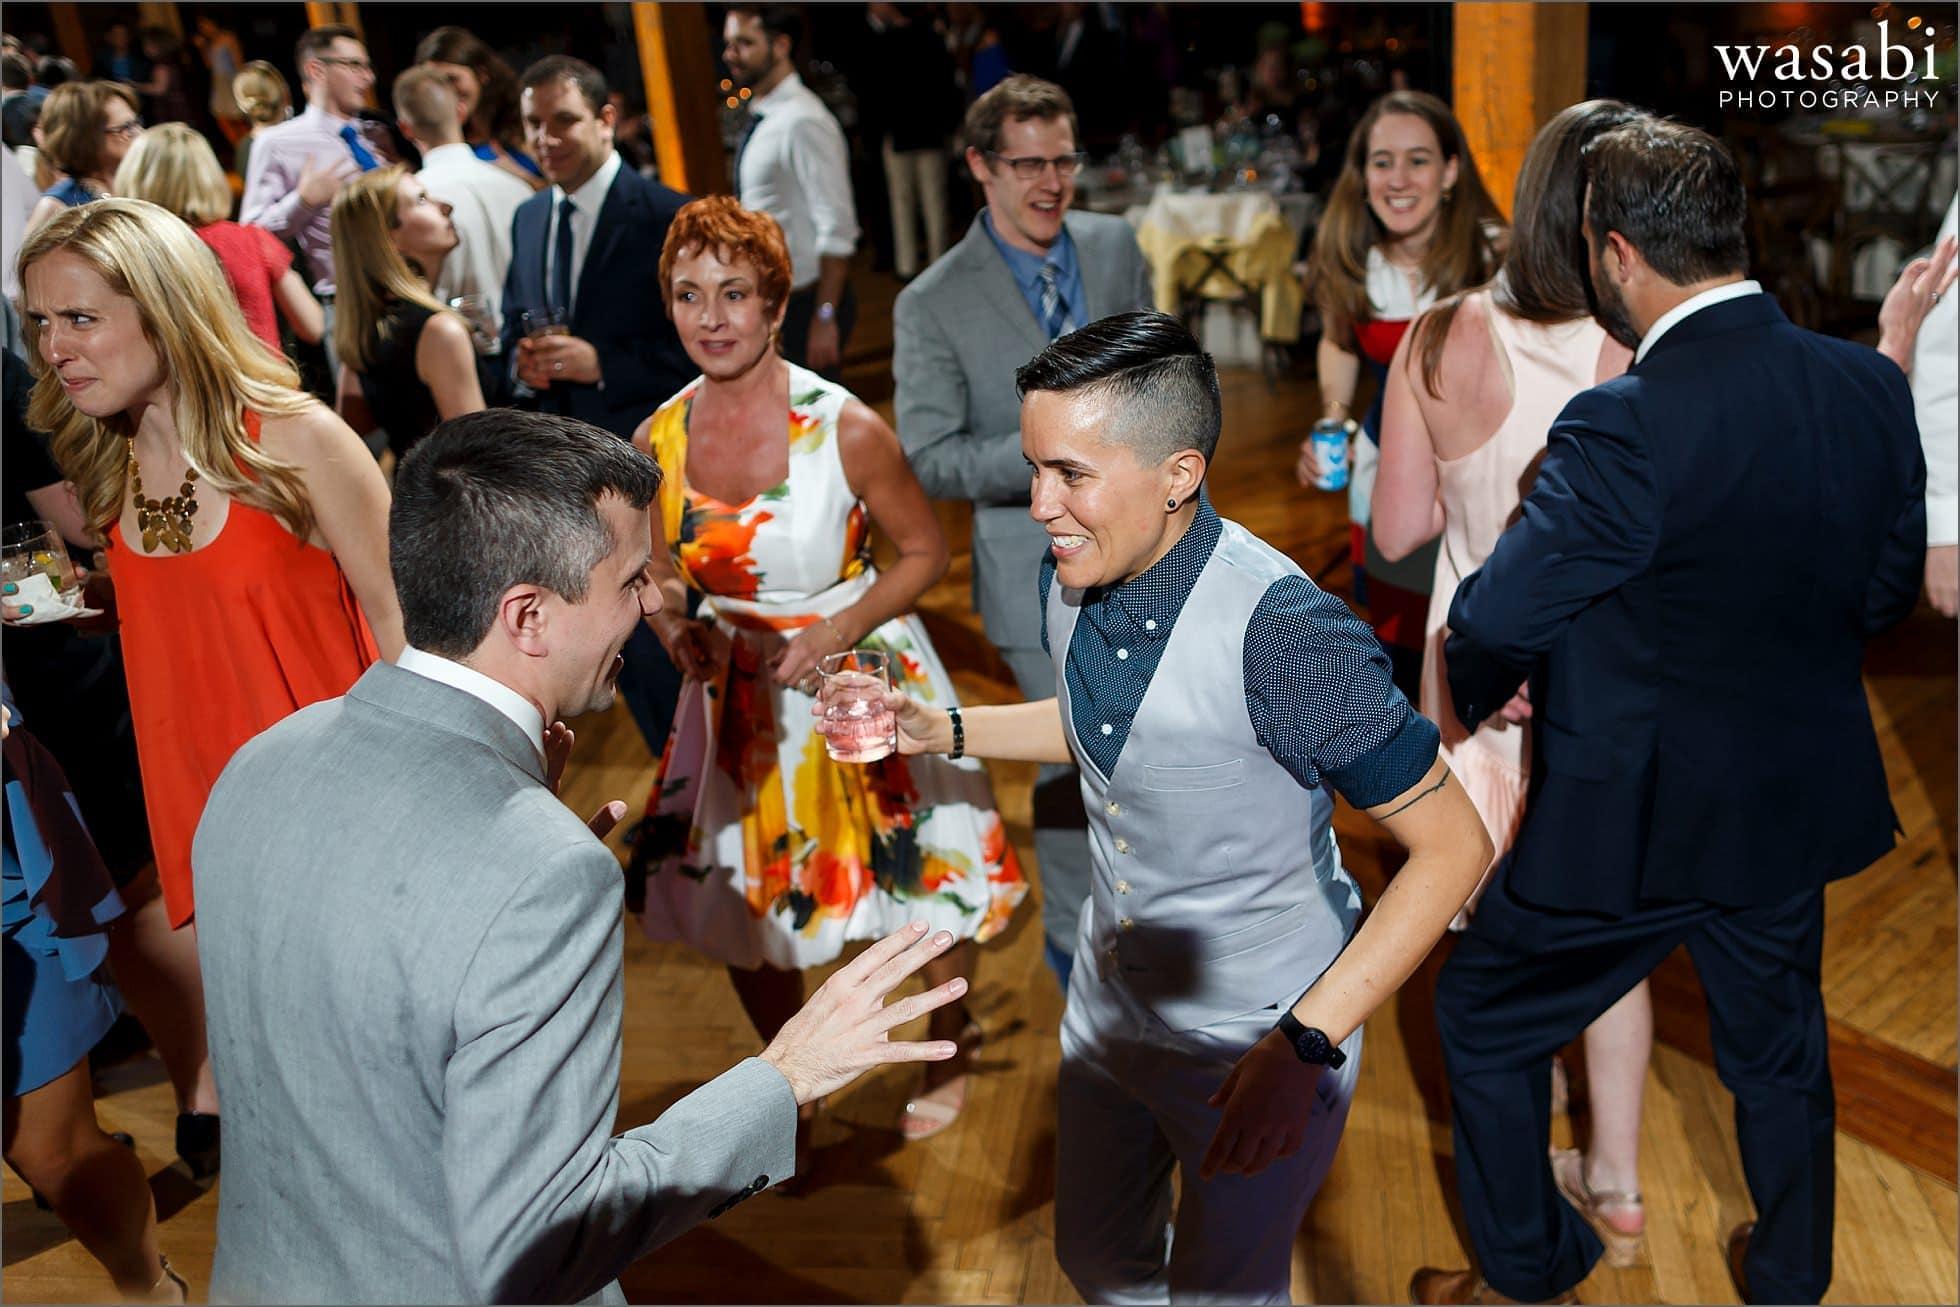 groom and sister dance during Skyline Loft wedding reception at Bridgeport Art Center in Chicago